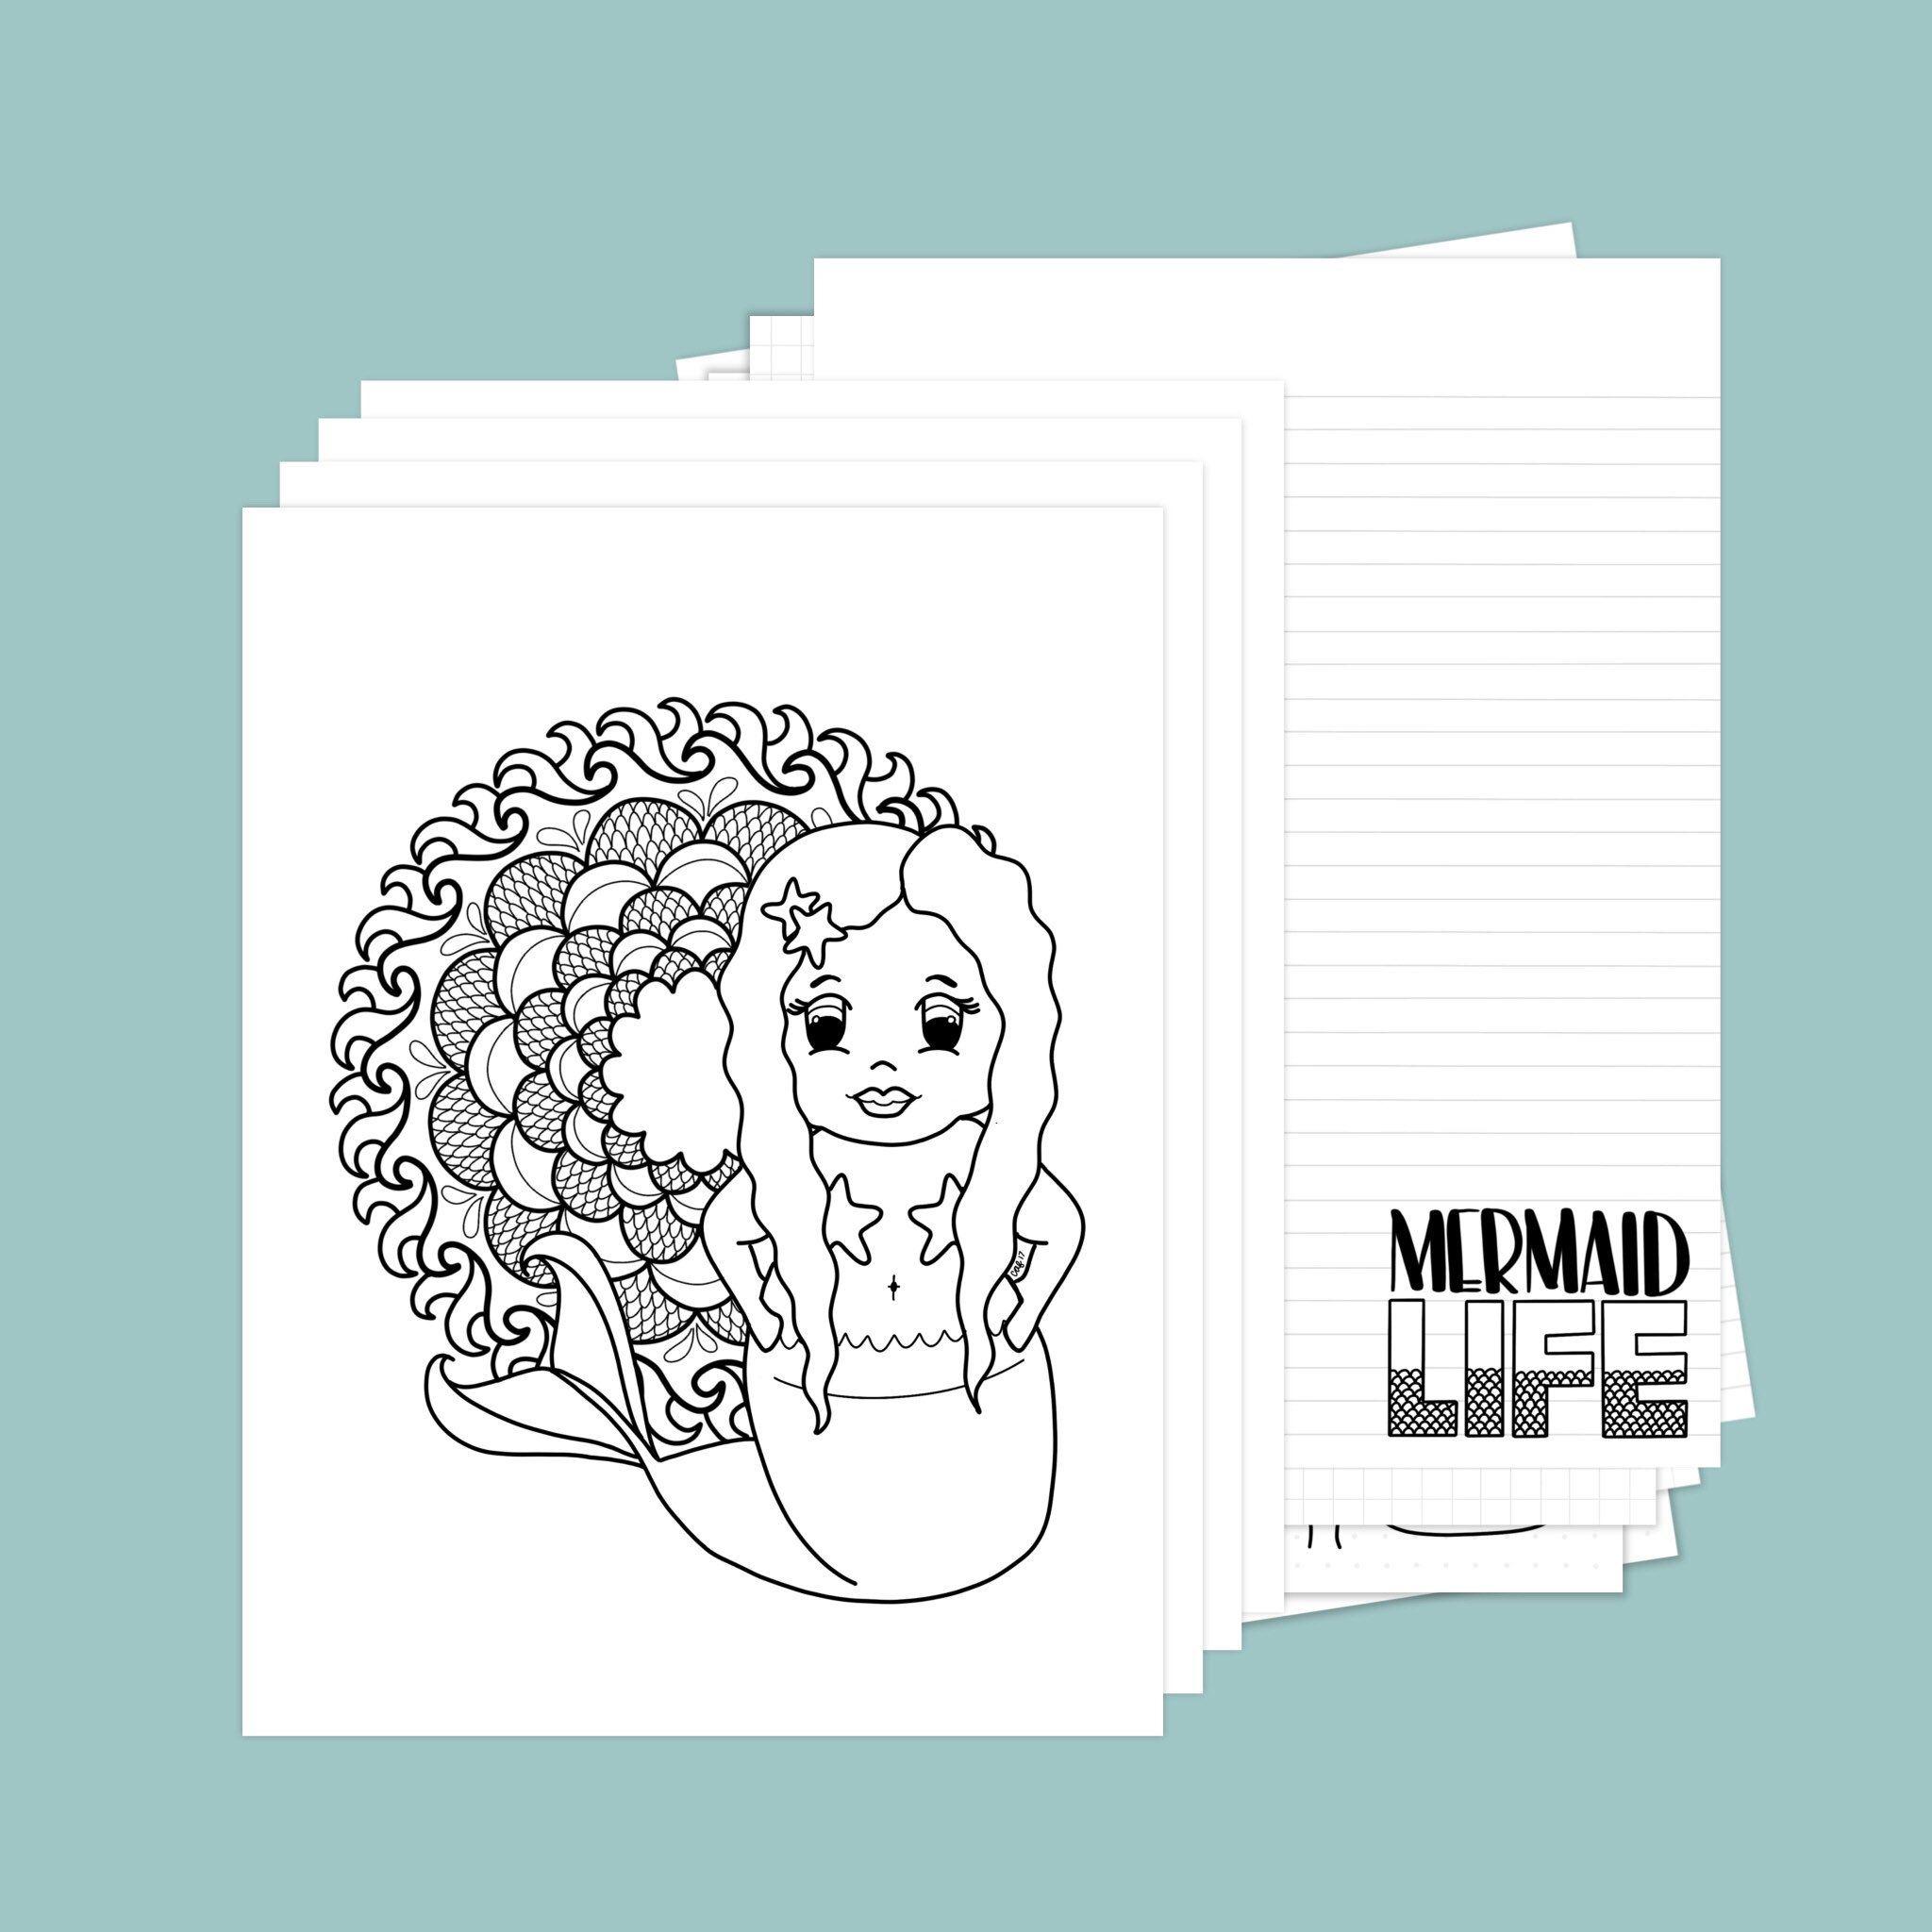 Mermaid Coloring and Journaling Bundle has 5 coloring